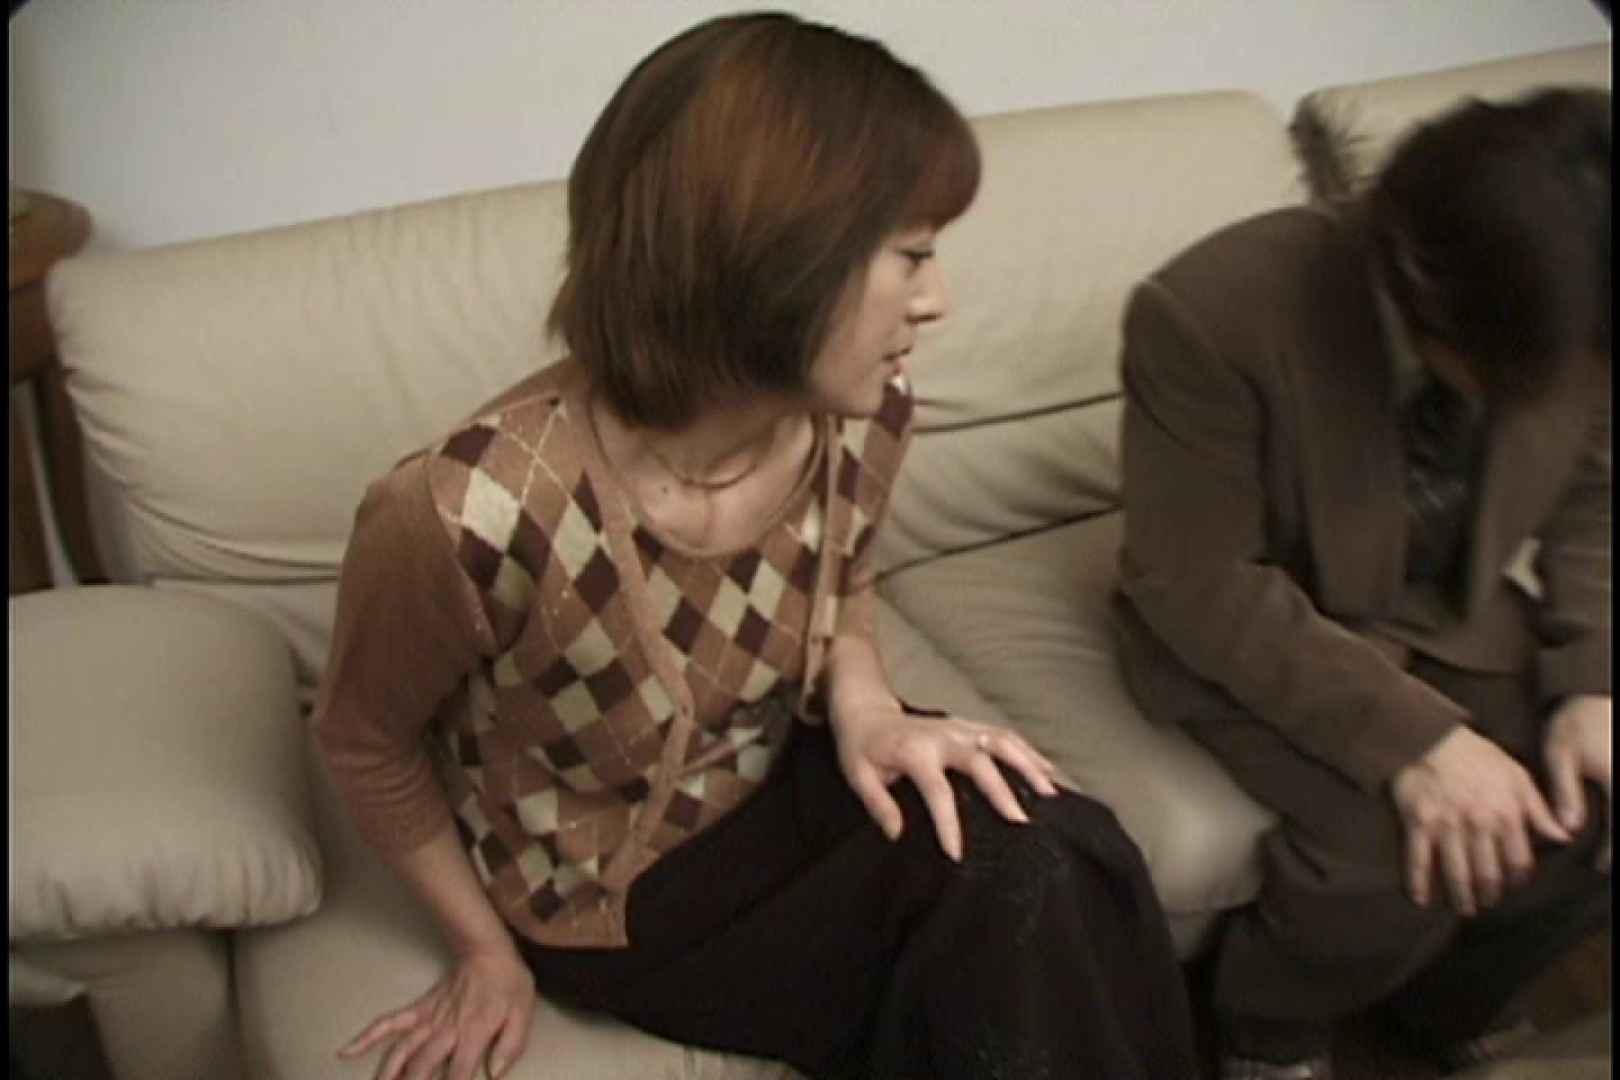 昼間の奥様は欲求不満 ~石川麻紀~ 熟女  111連発 19